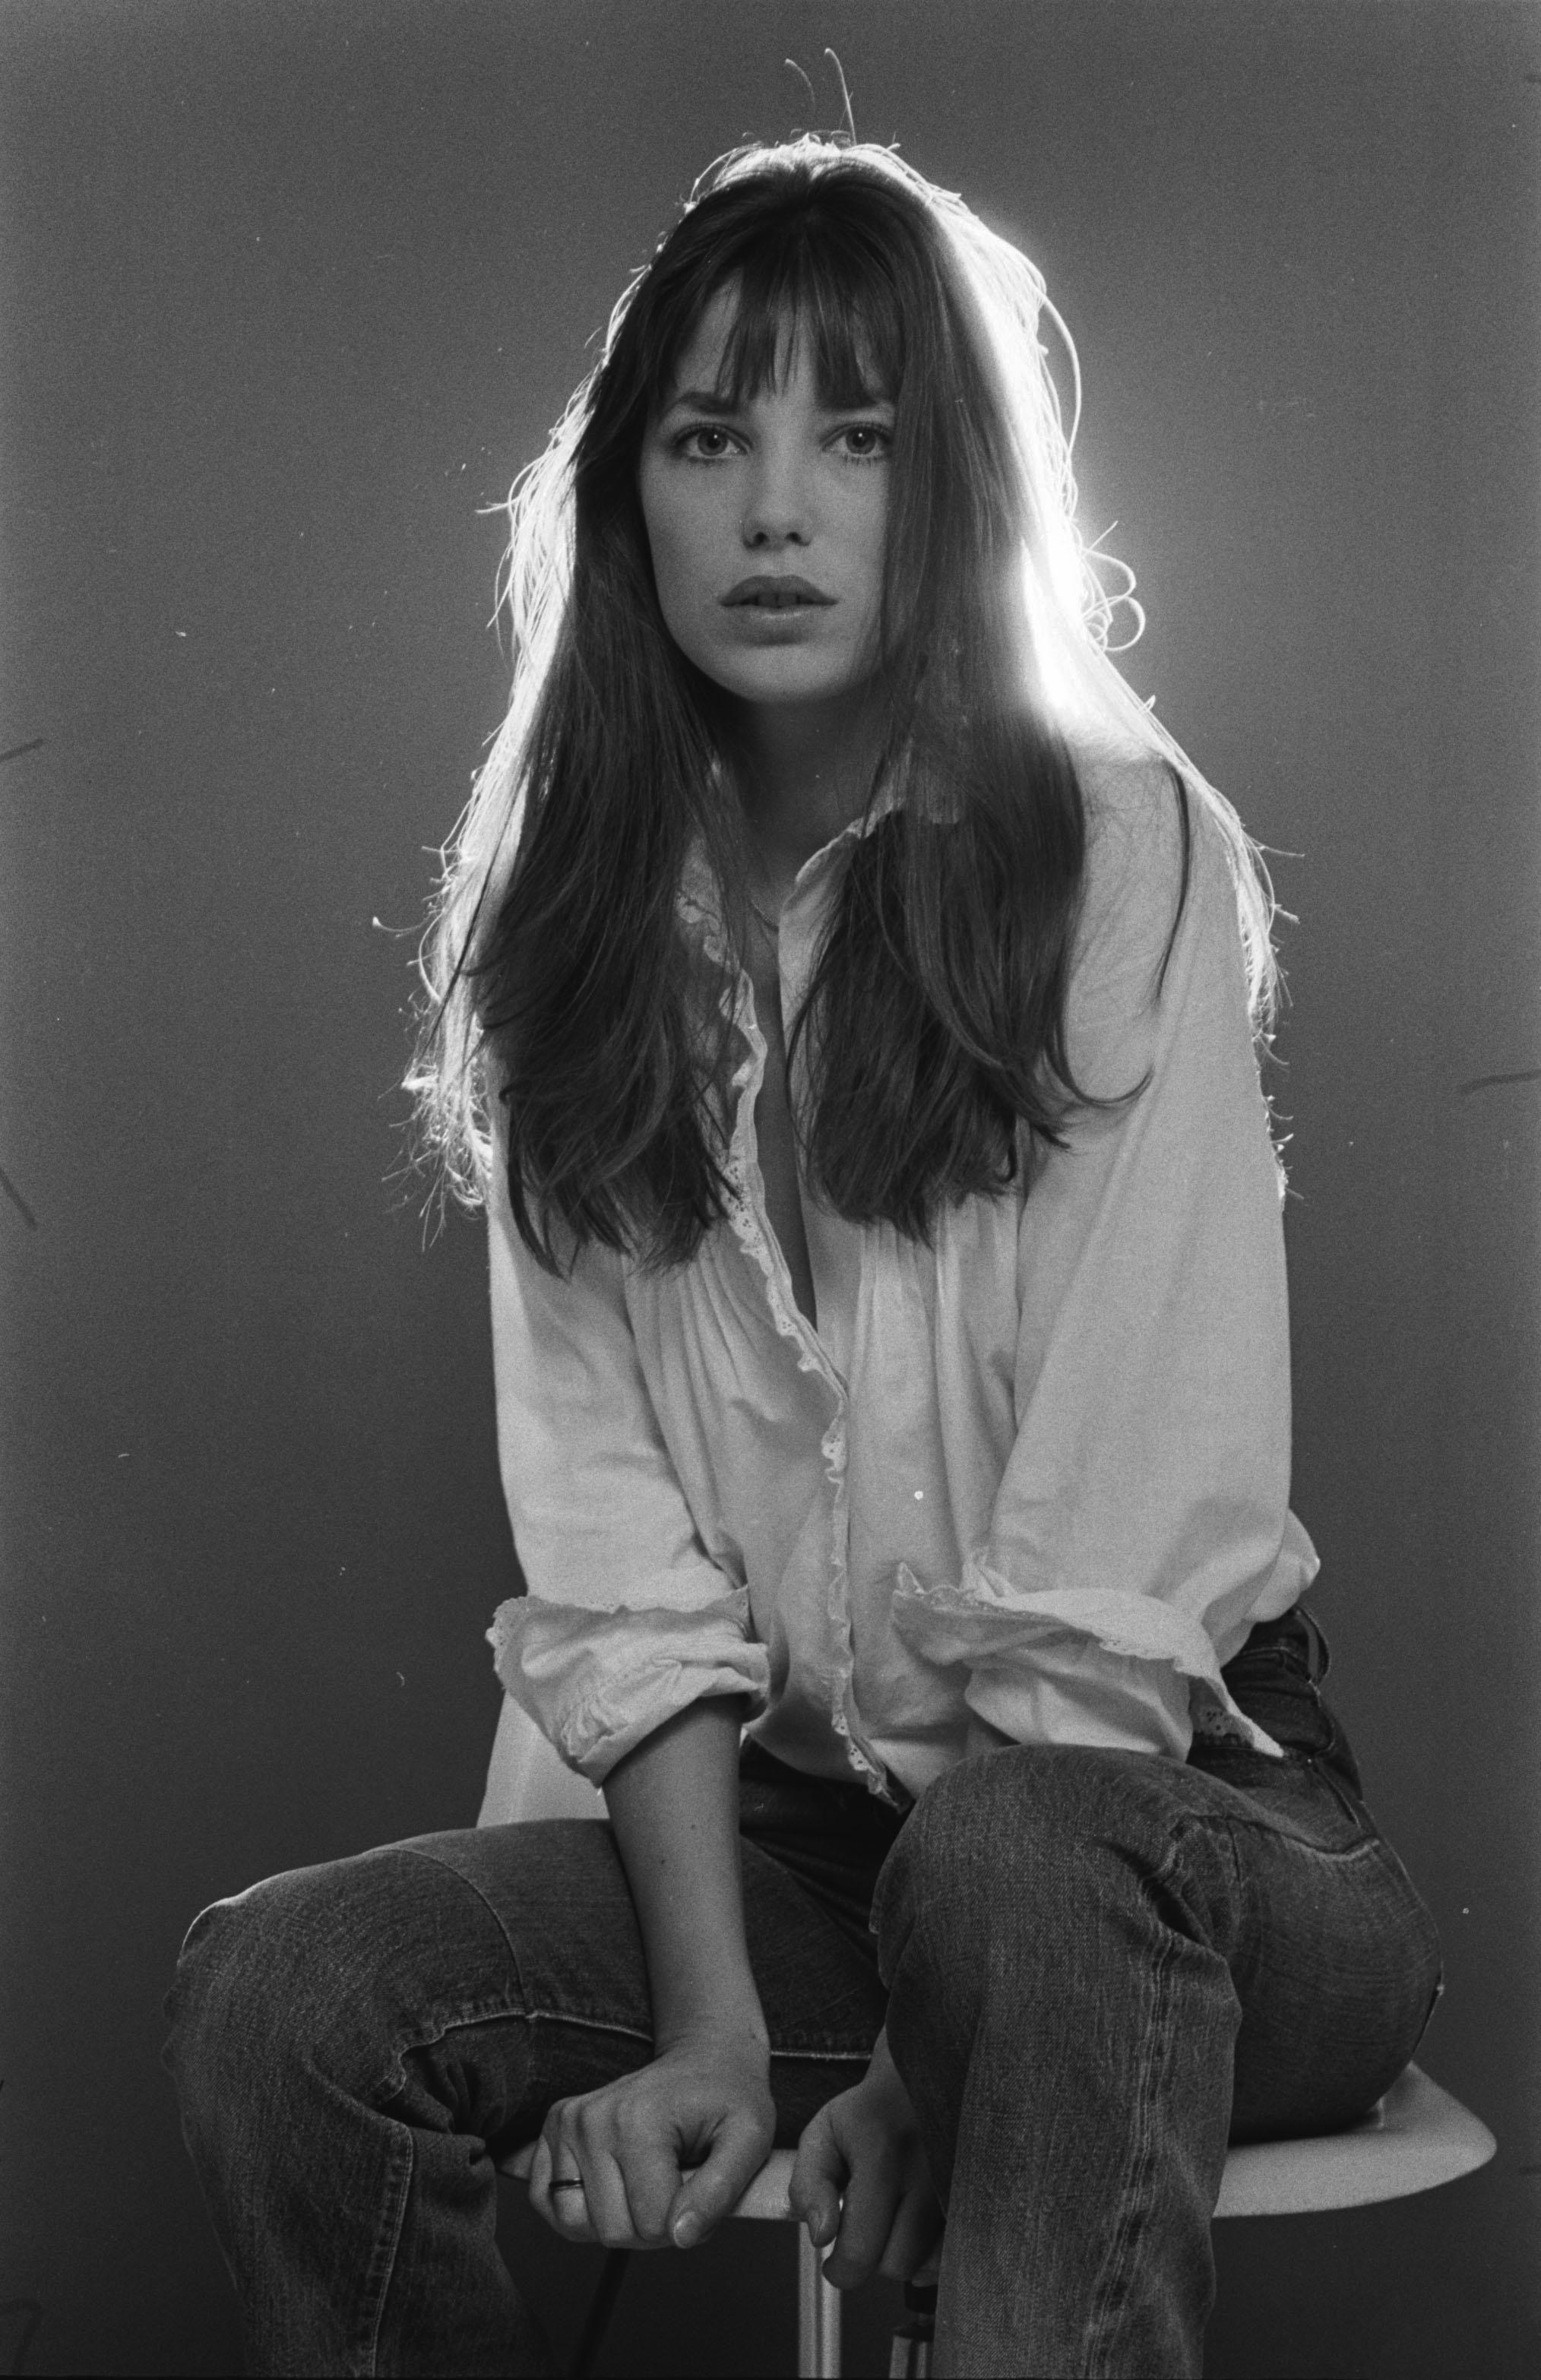 Jane birkin picture - Jane Birkin Pic 484326